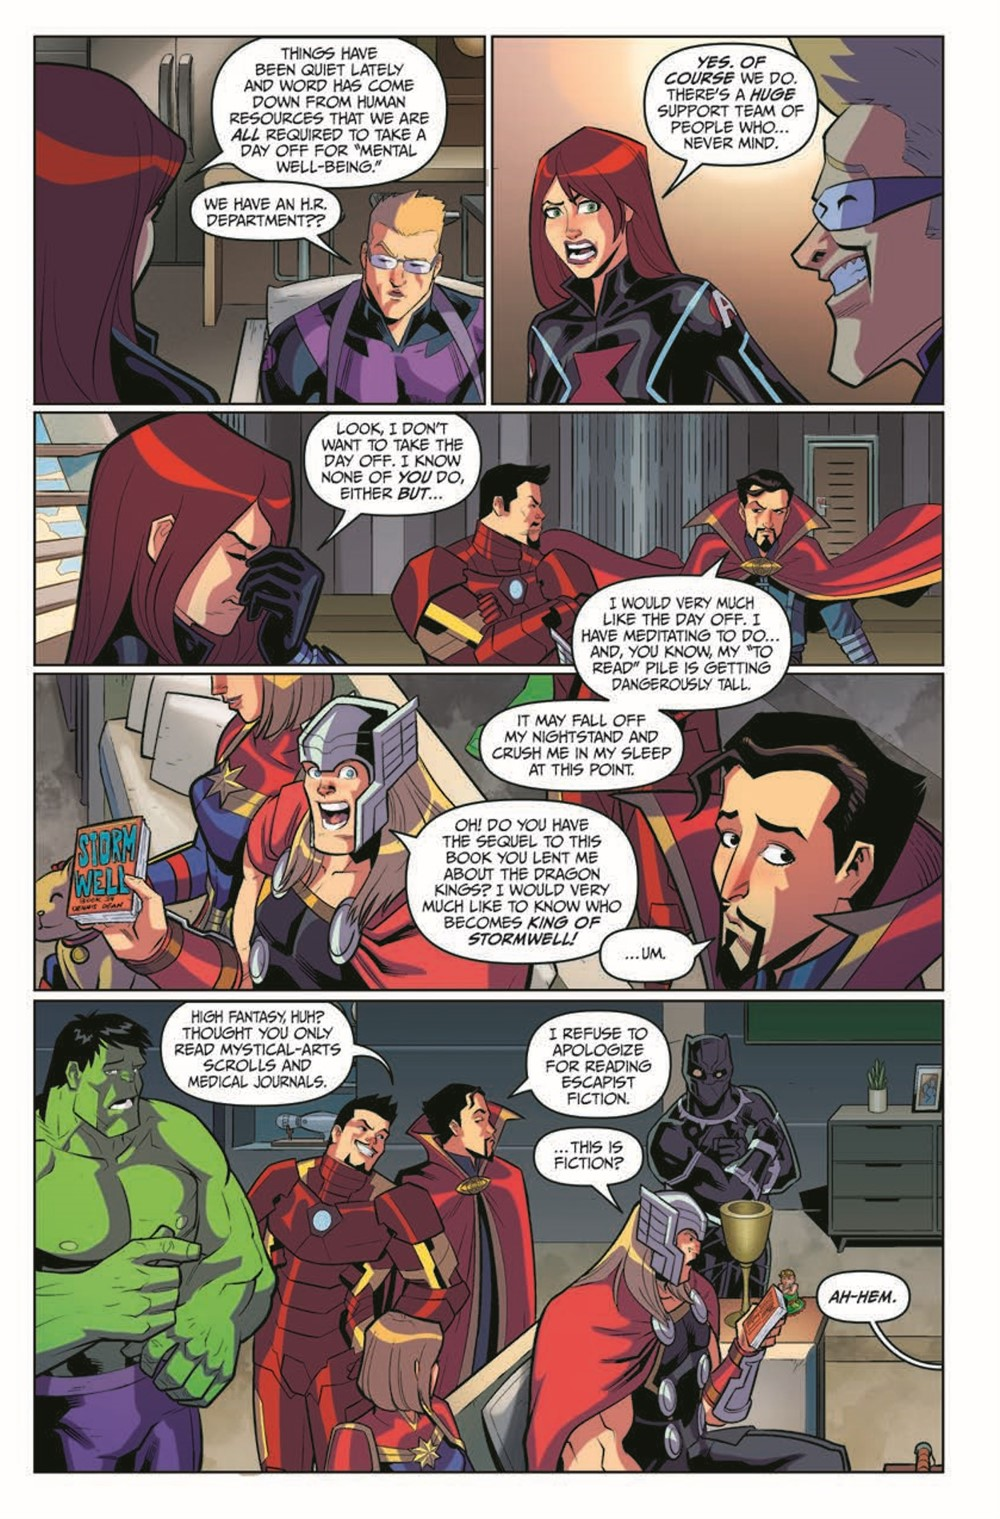 MarvelAction_Avengers_Vol.1_OffTheClock_TPB_pr-5 ComicList Previews: MARVEL ACTION AVENGERS VOLUME 5 OFF THE CLOCK TP